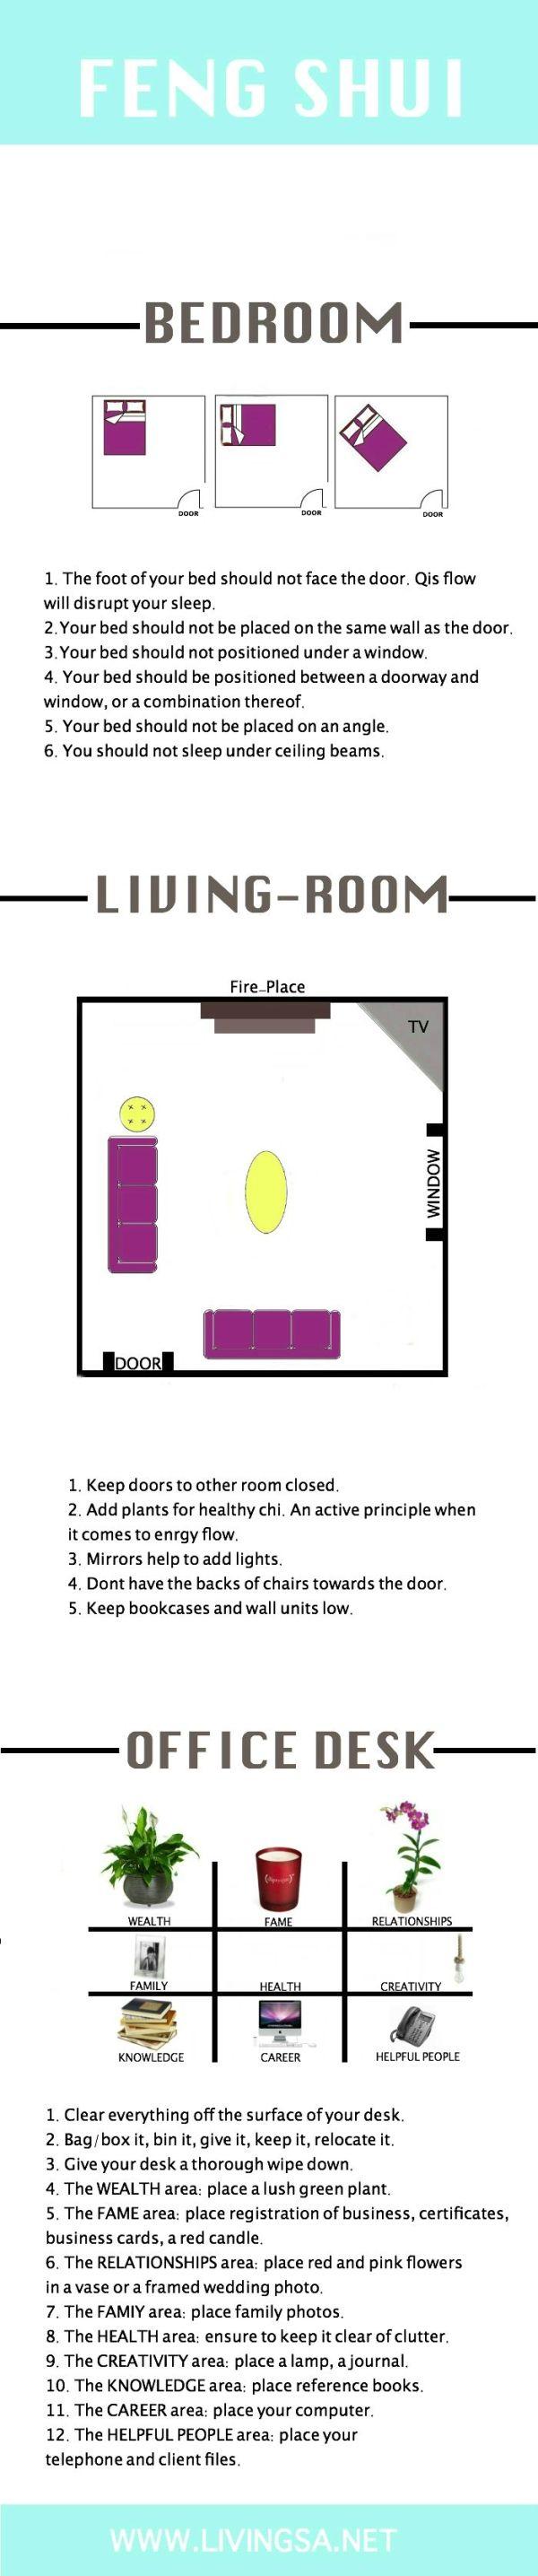 Best 25 feng shui habitacion ideas on pinterest casa - Decoracion feng shui ...